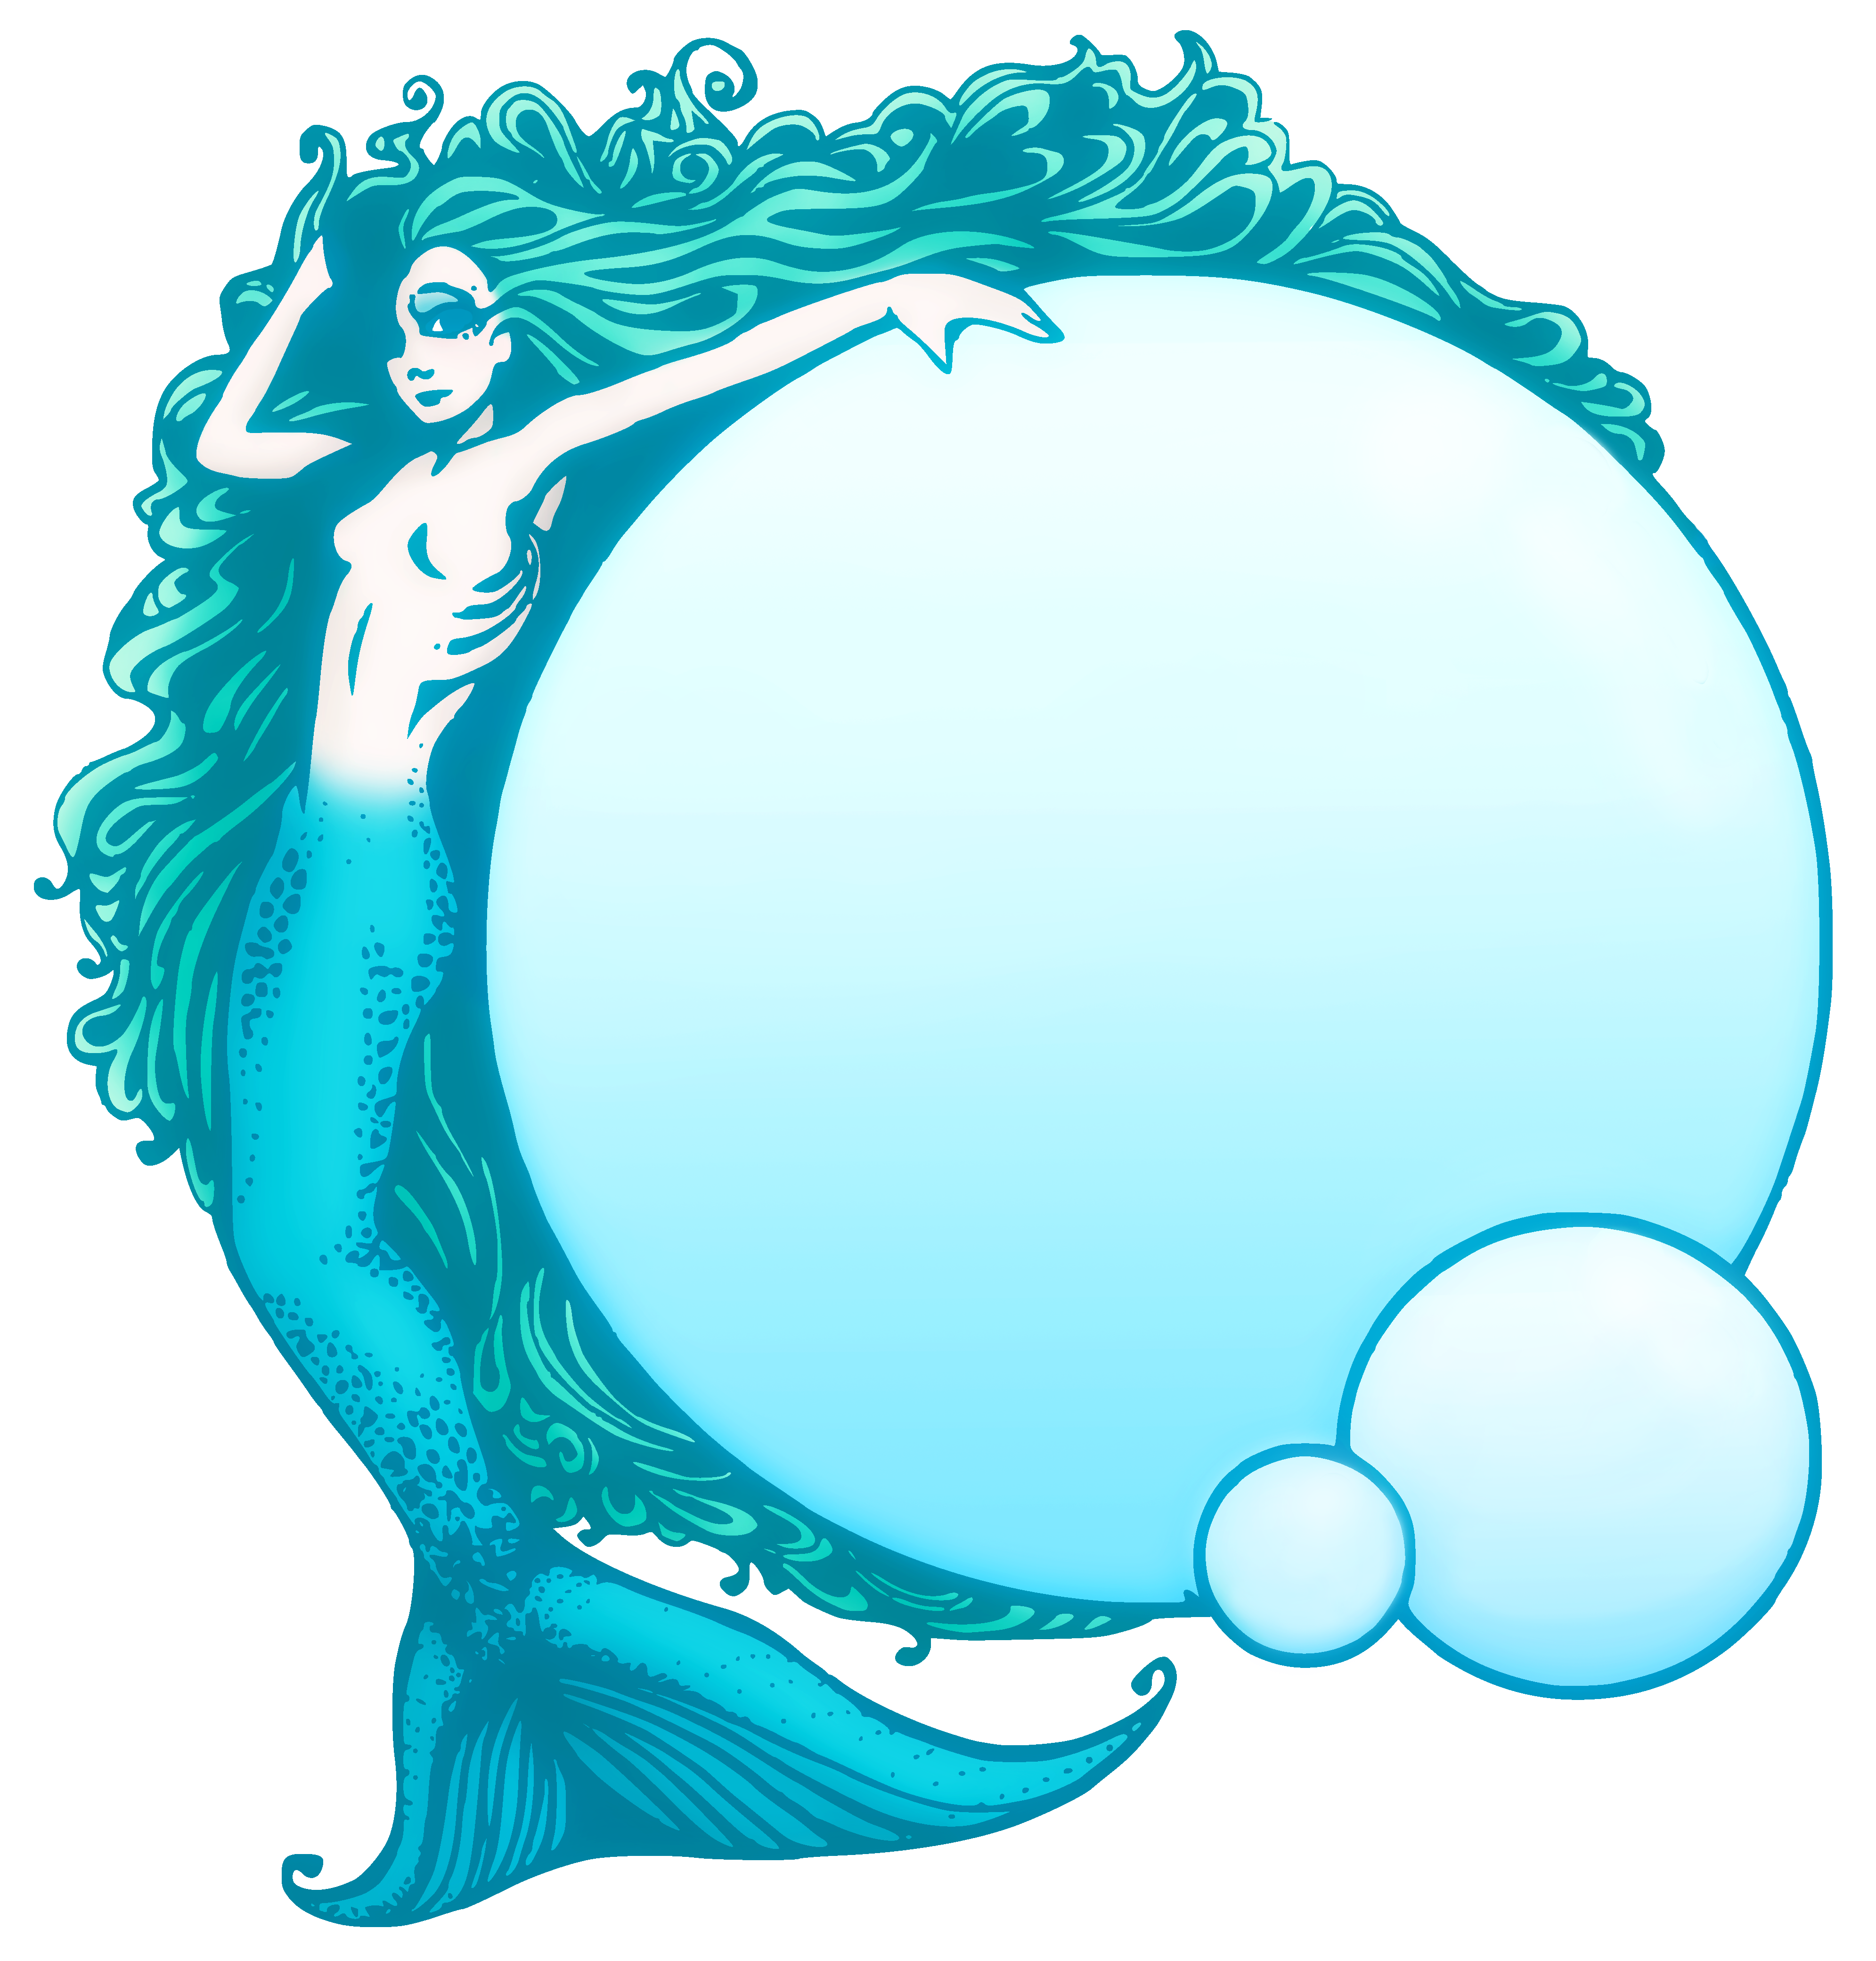 Mermaid clipart public domain Mermaid Art Clipart Public Public